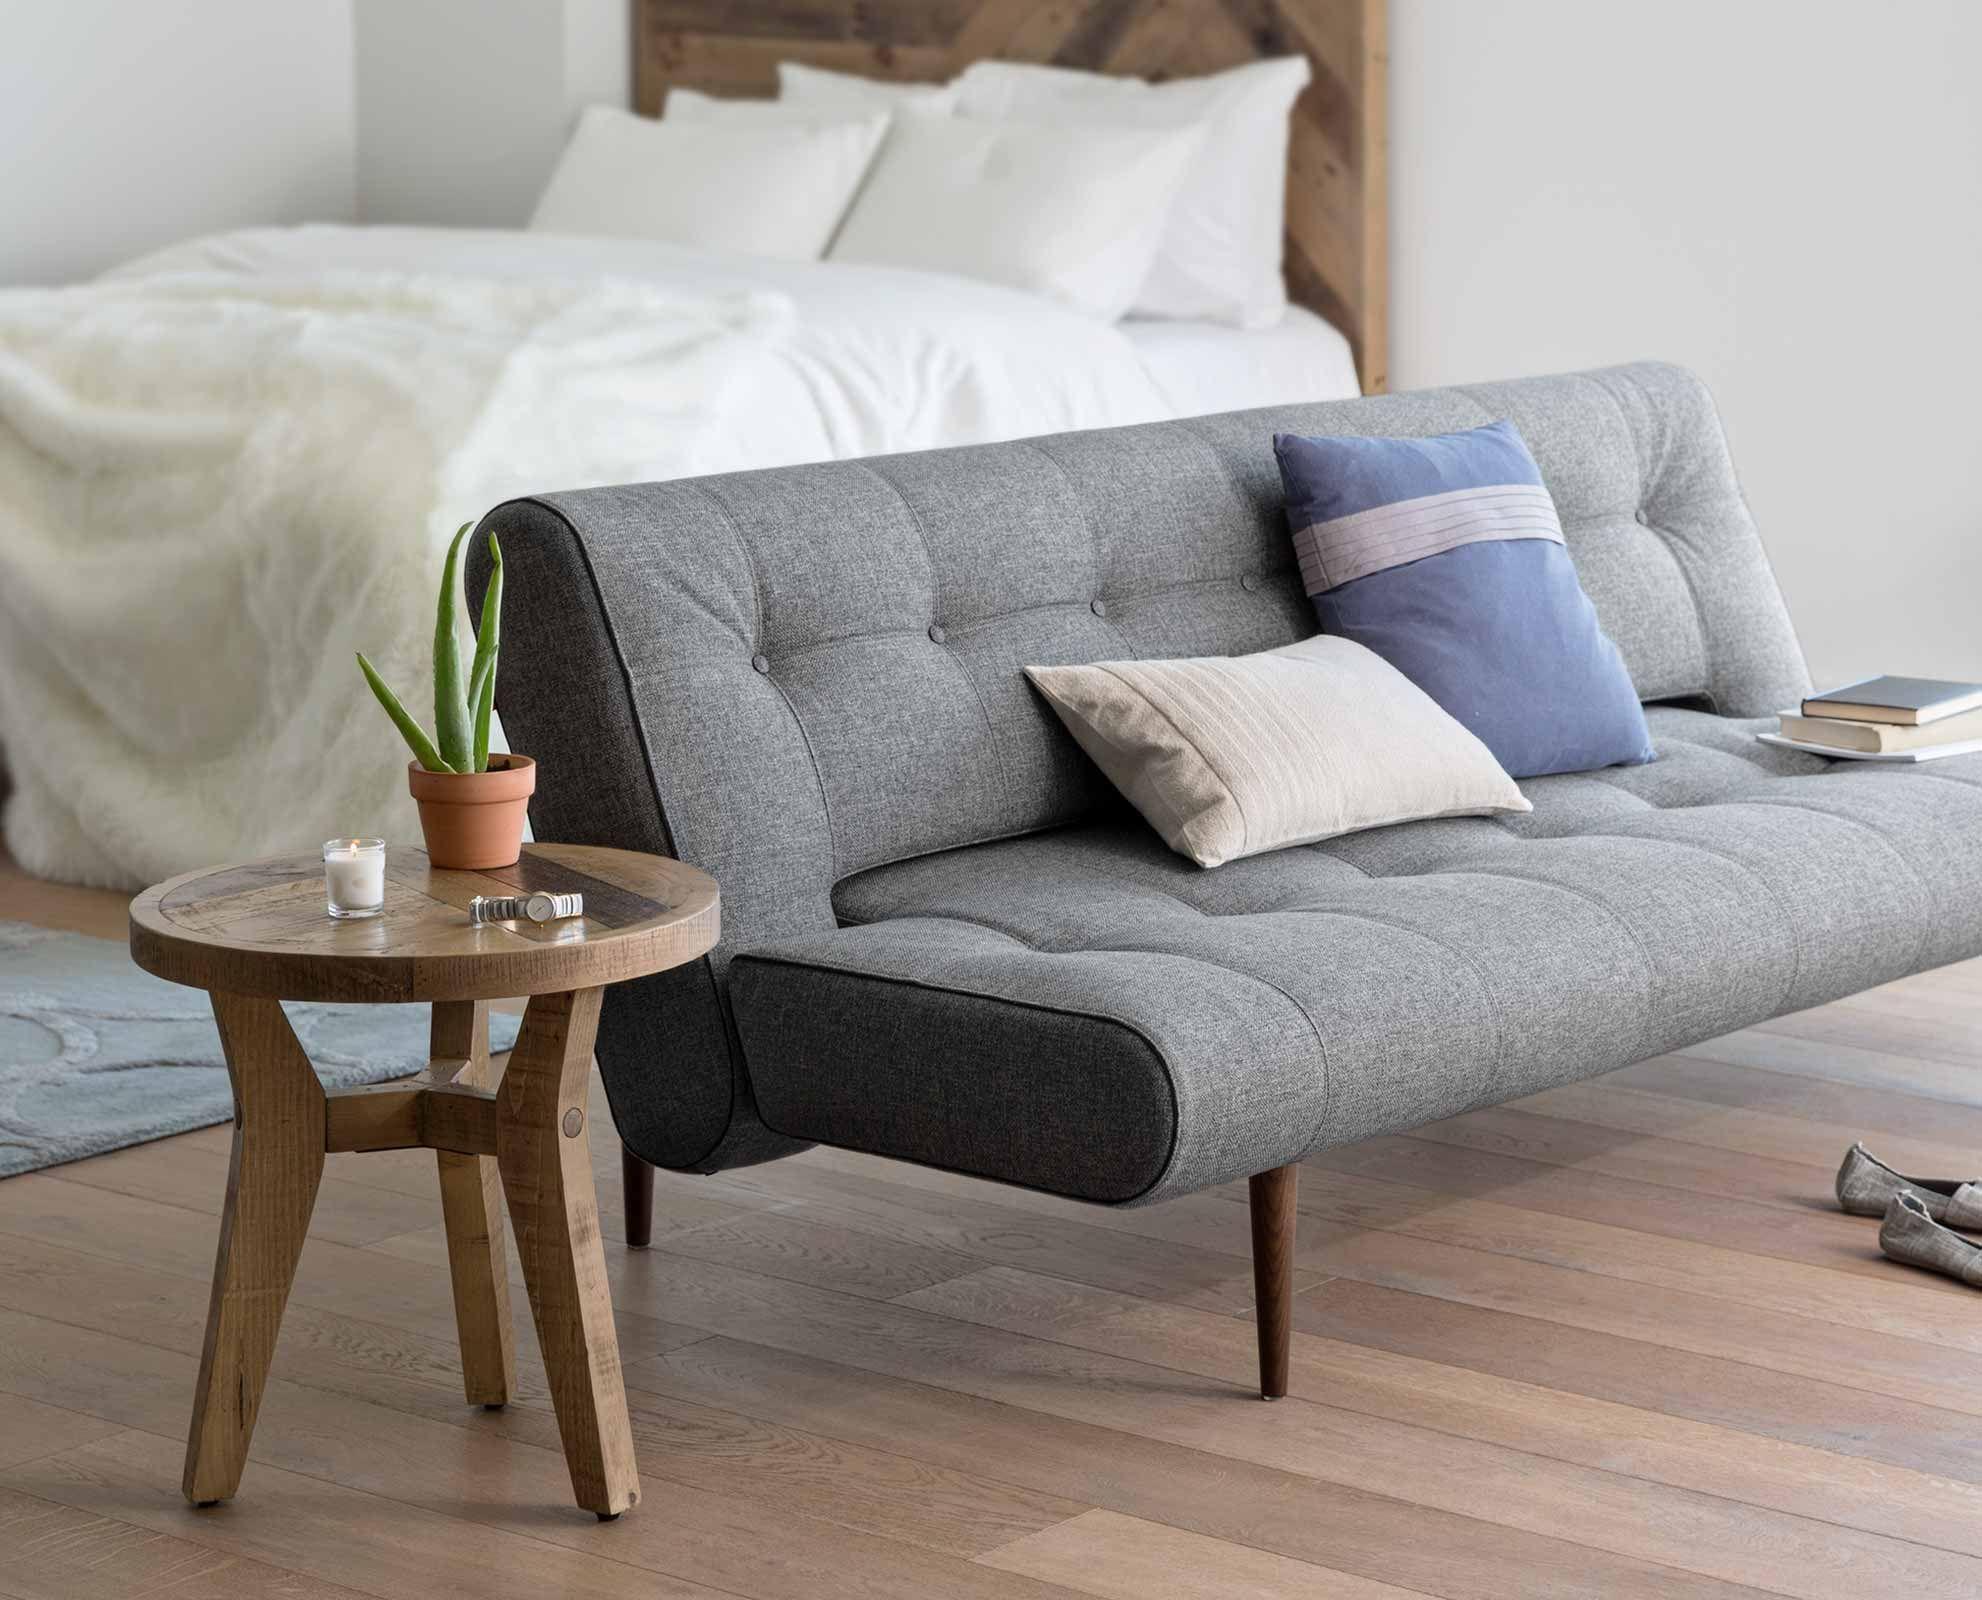 Tropeca Convertible Sofa By Scandinavian Designs Stylish Functional And Airy The Tropeca Convertible Sofa Is Ideal F Grey Sofa Design Convertible Sofa Sofa